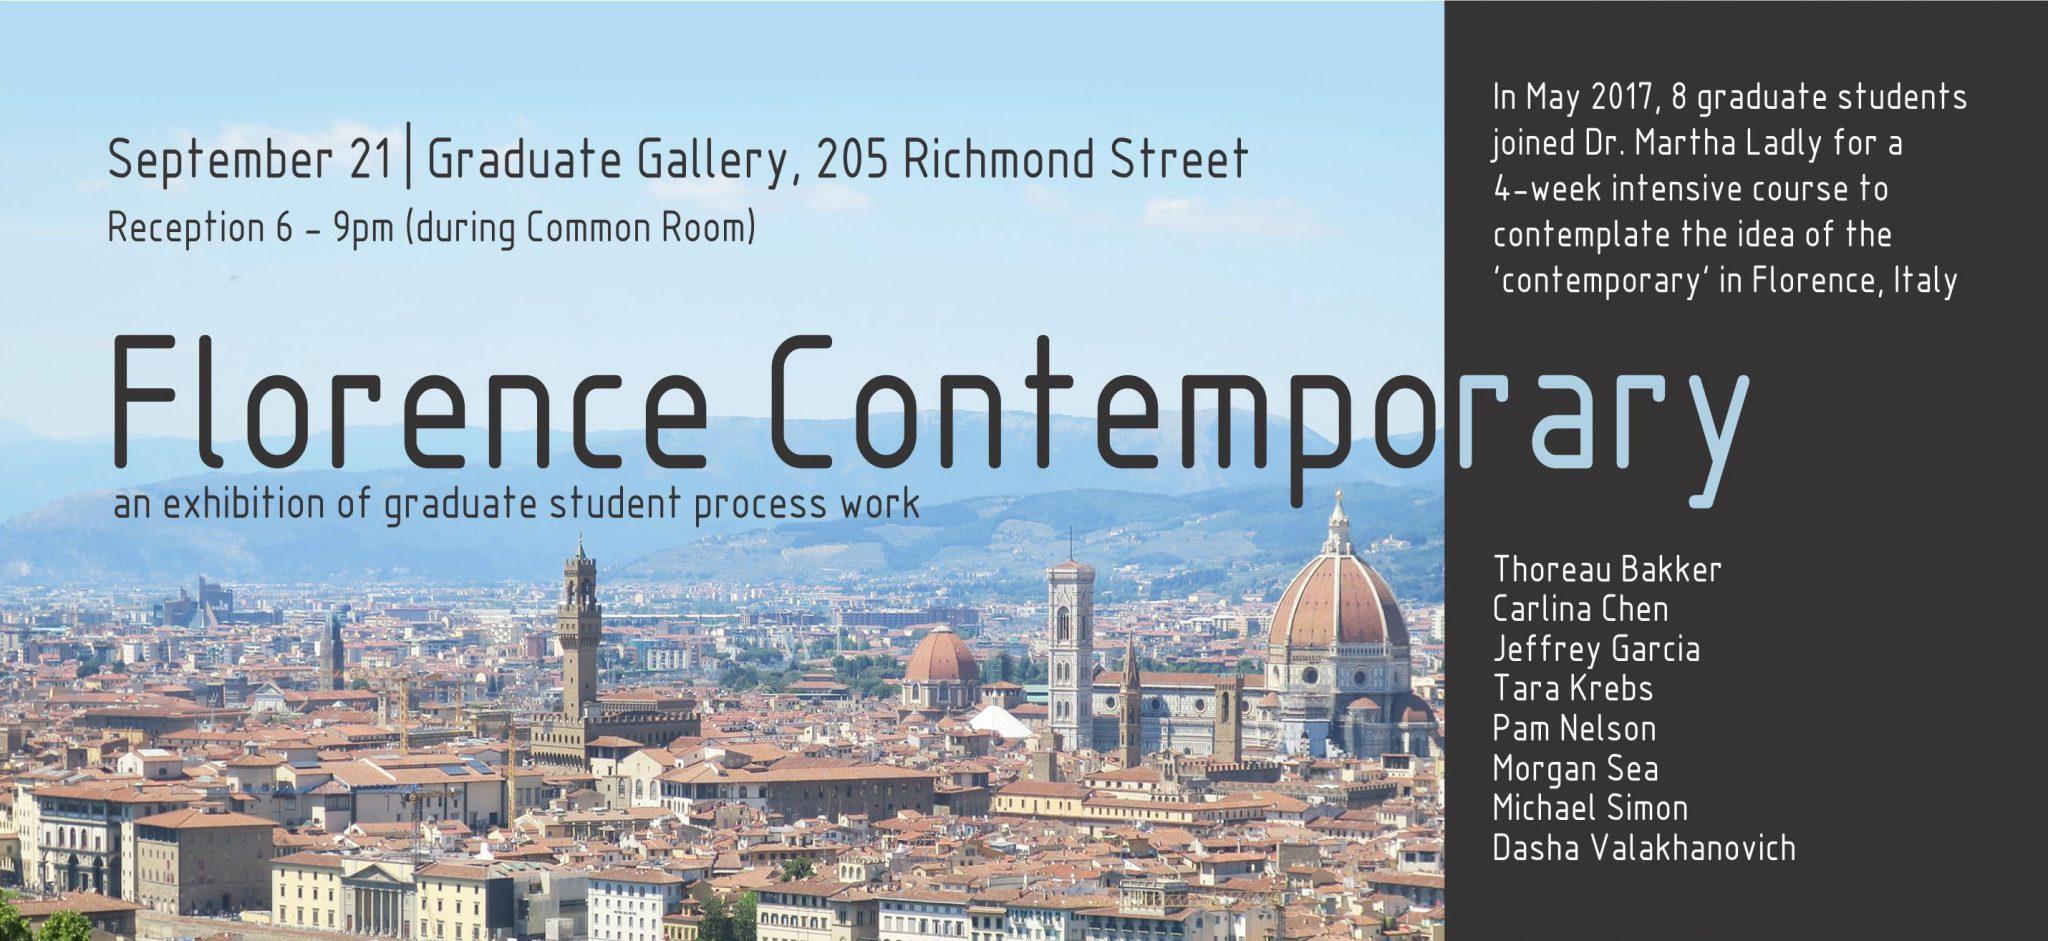 Florence Exhibiton